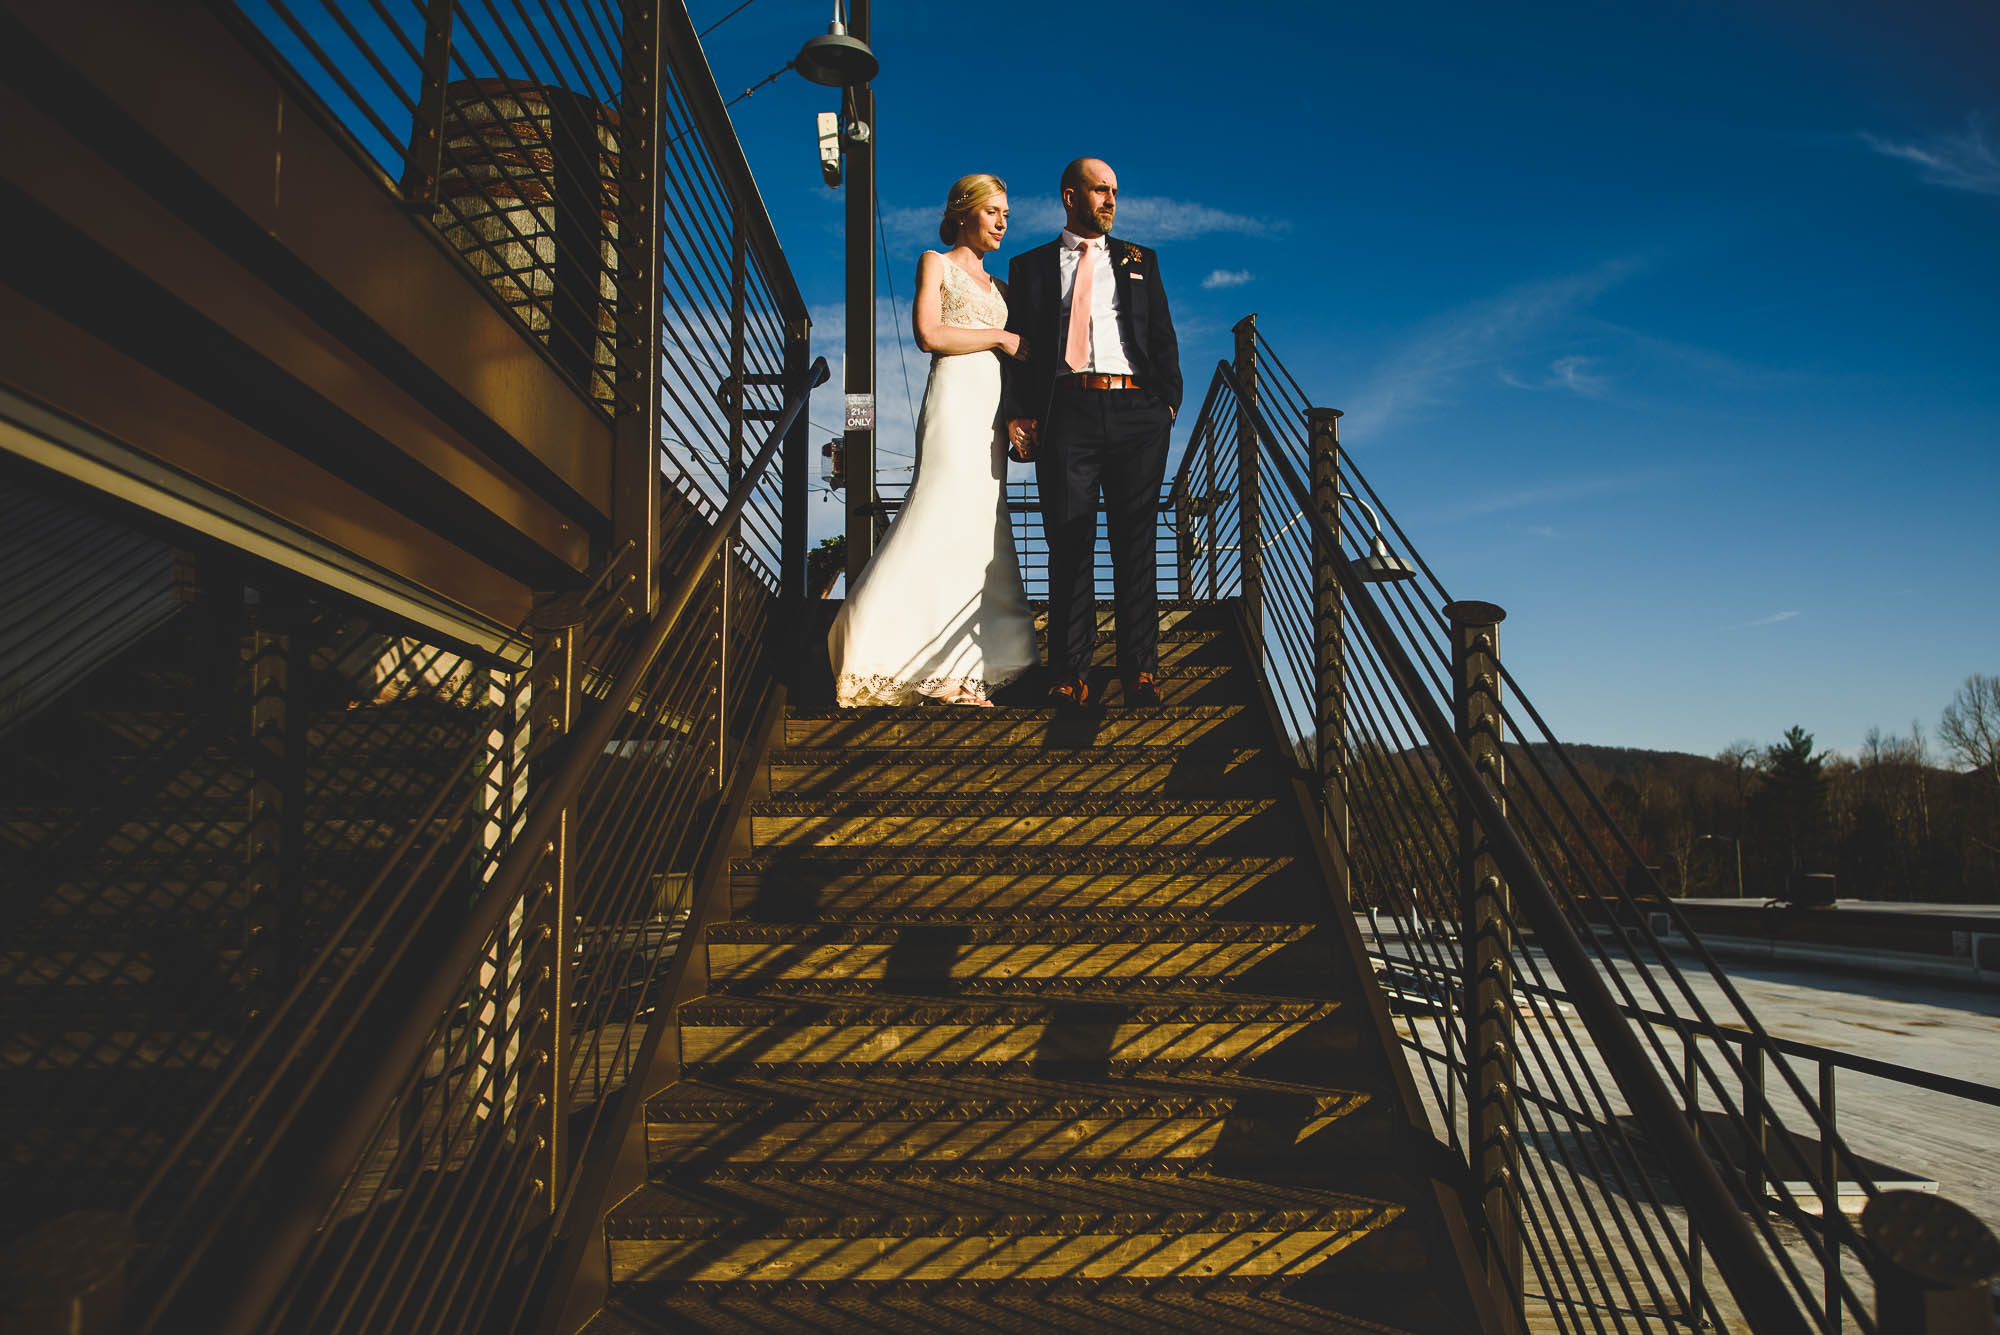 Rooftop wedding portraits